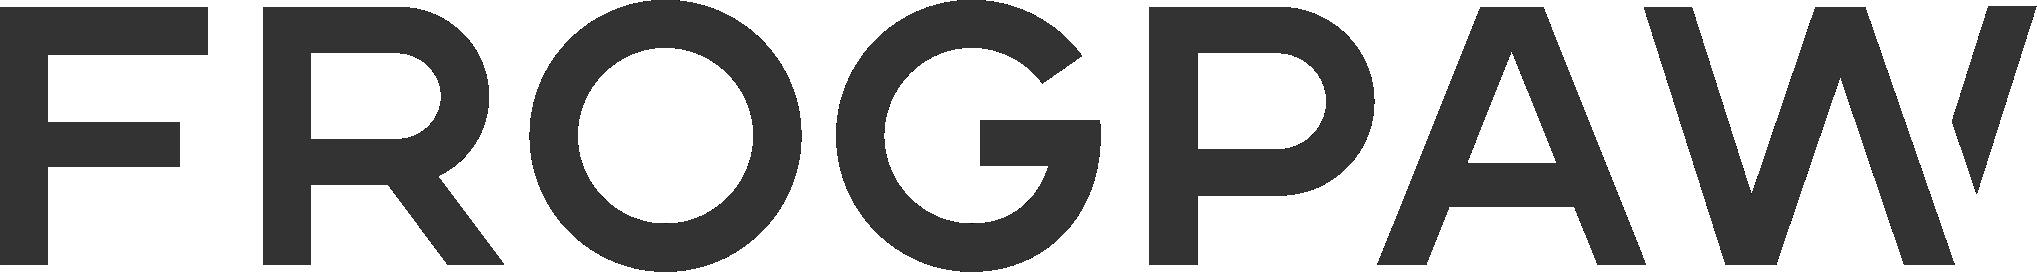 frogpaw logo